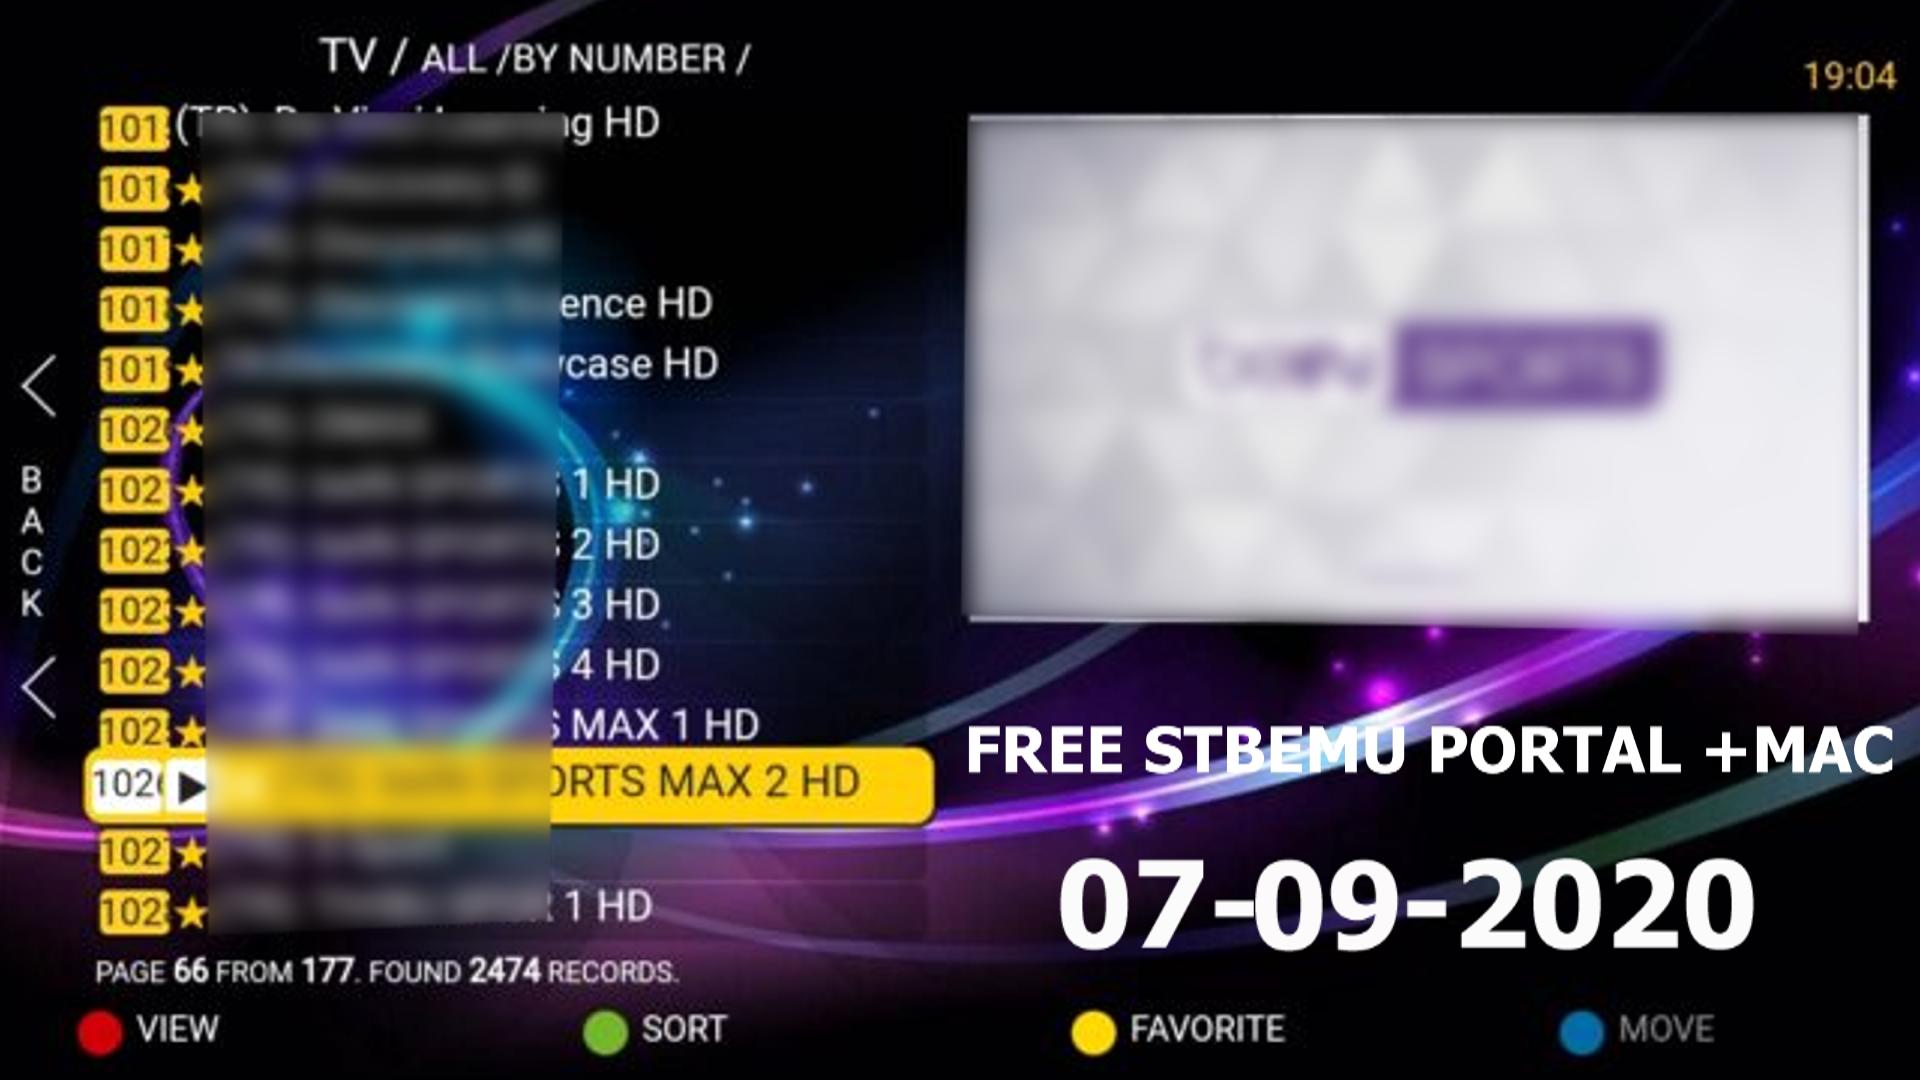 Stb Emu Free Portal Mac Iptv Daily M3u 07 09 2020 App Free Emu